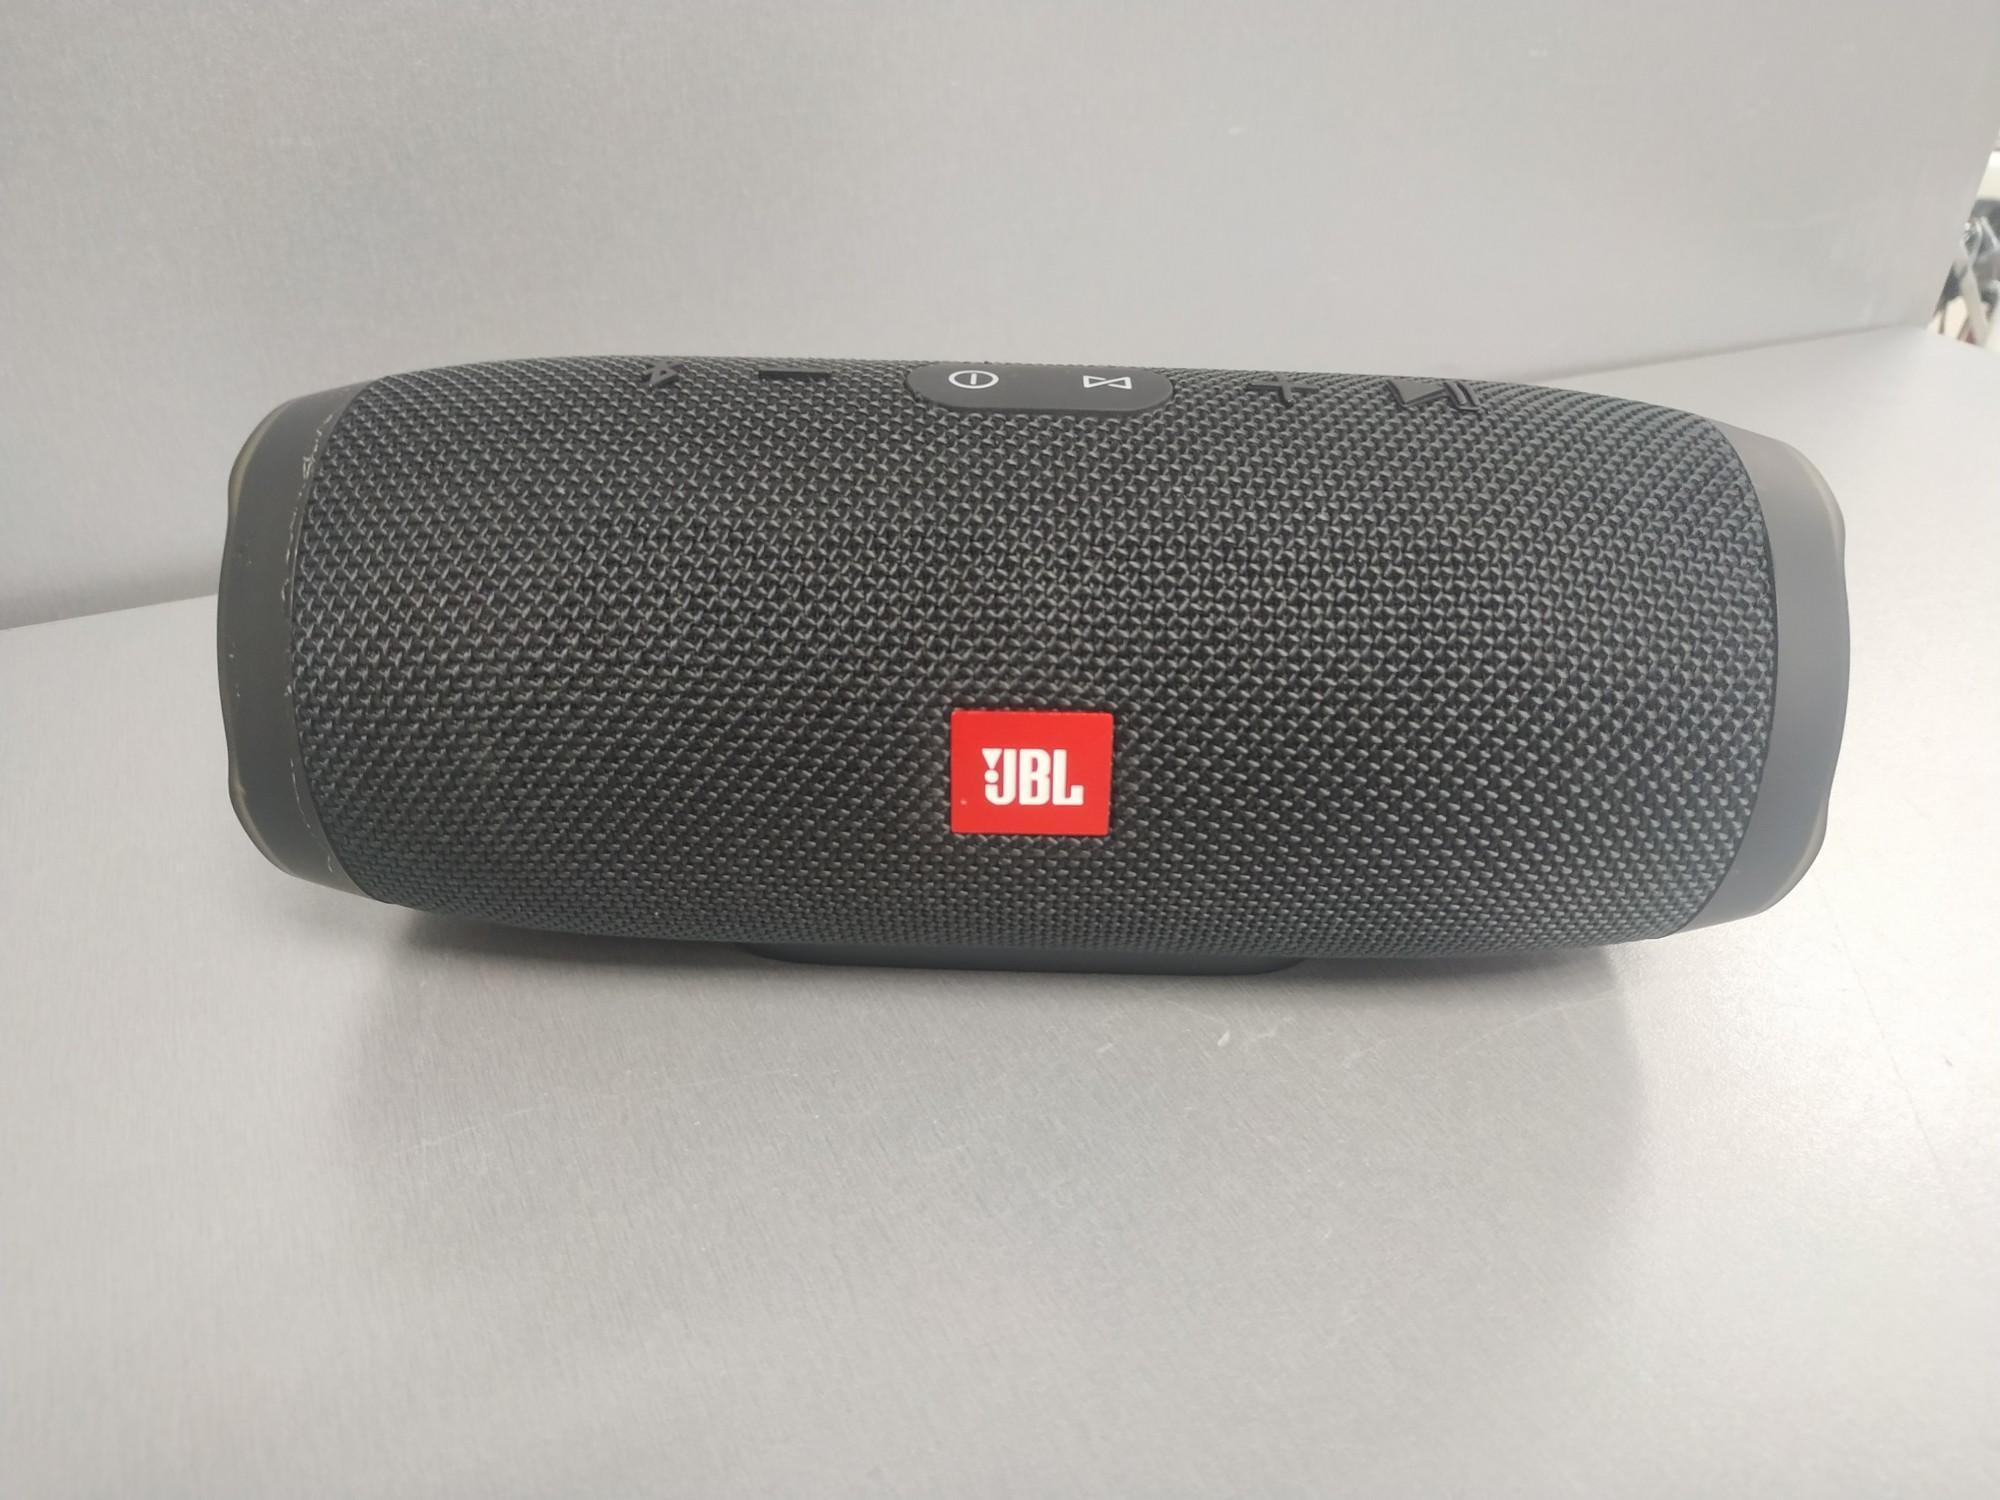 aa8b43c2a62 Bluetooth kõlar JBL Charge 3 - Luutar